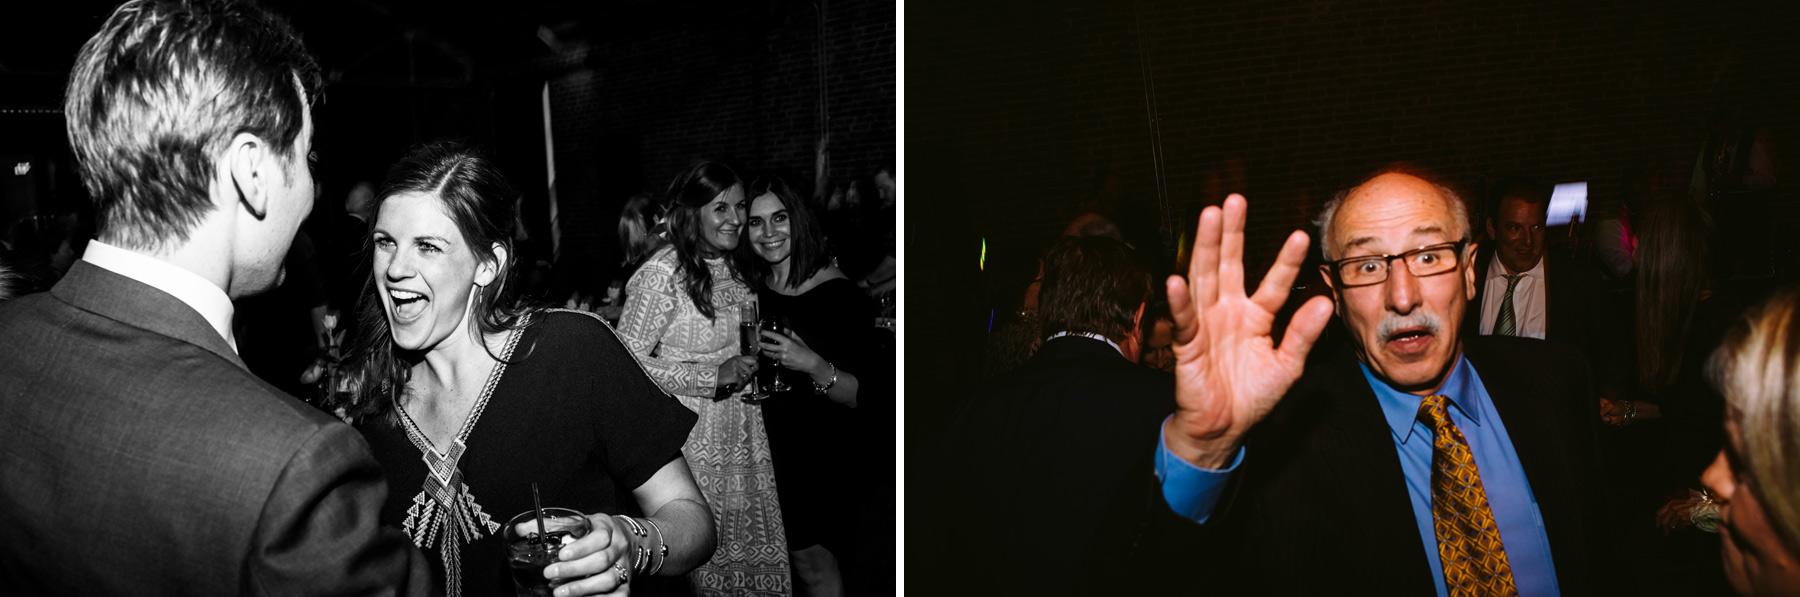 Pete + Susannah The Guild Kansas City Bohemian Outdoor Wedding _Kindling Wedding Photography - 73.JPG